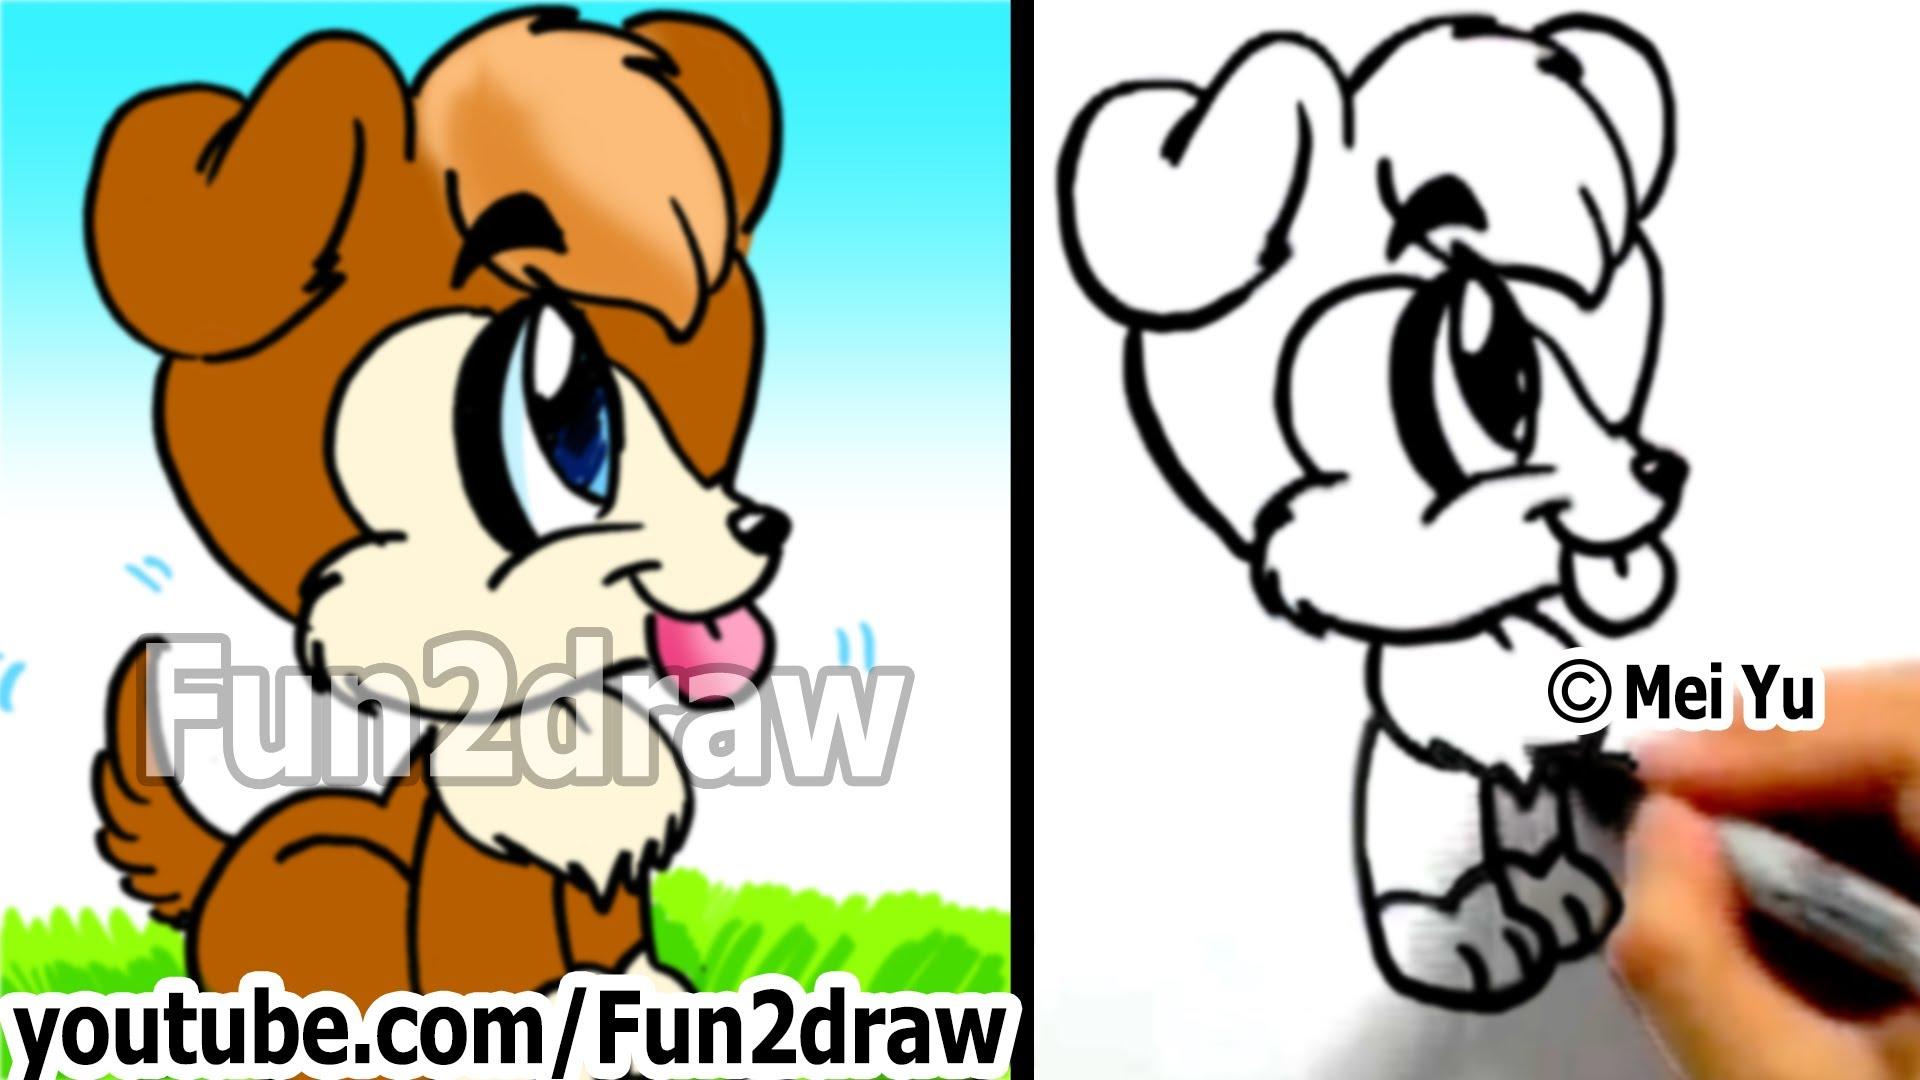 1920x1080 How To Draw A Cute Cartoon Dog Under 2 Min